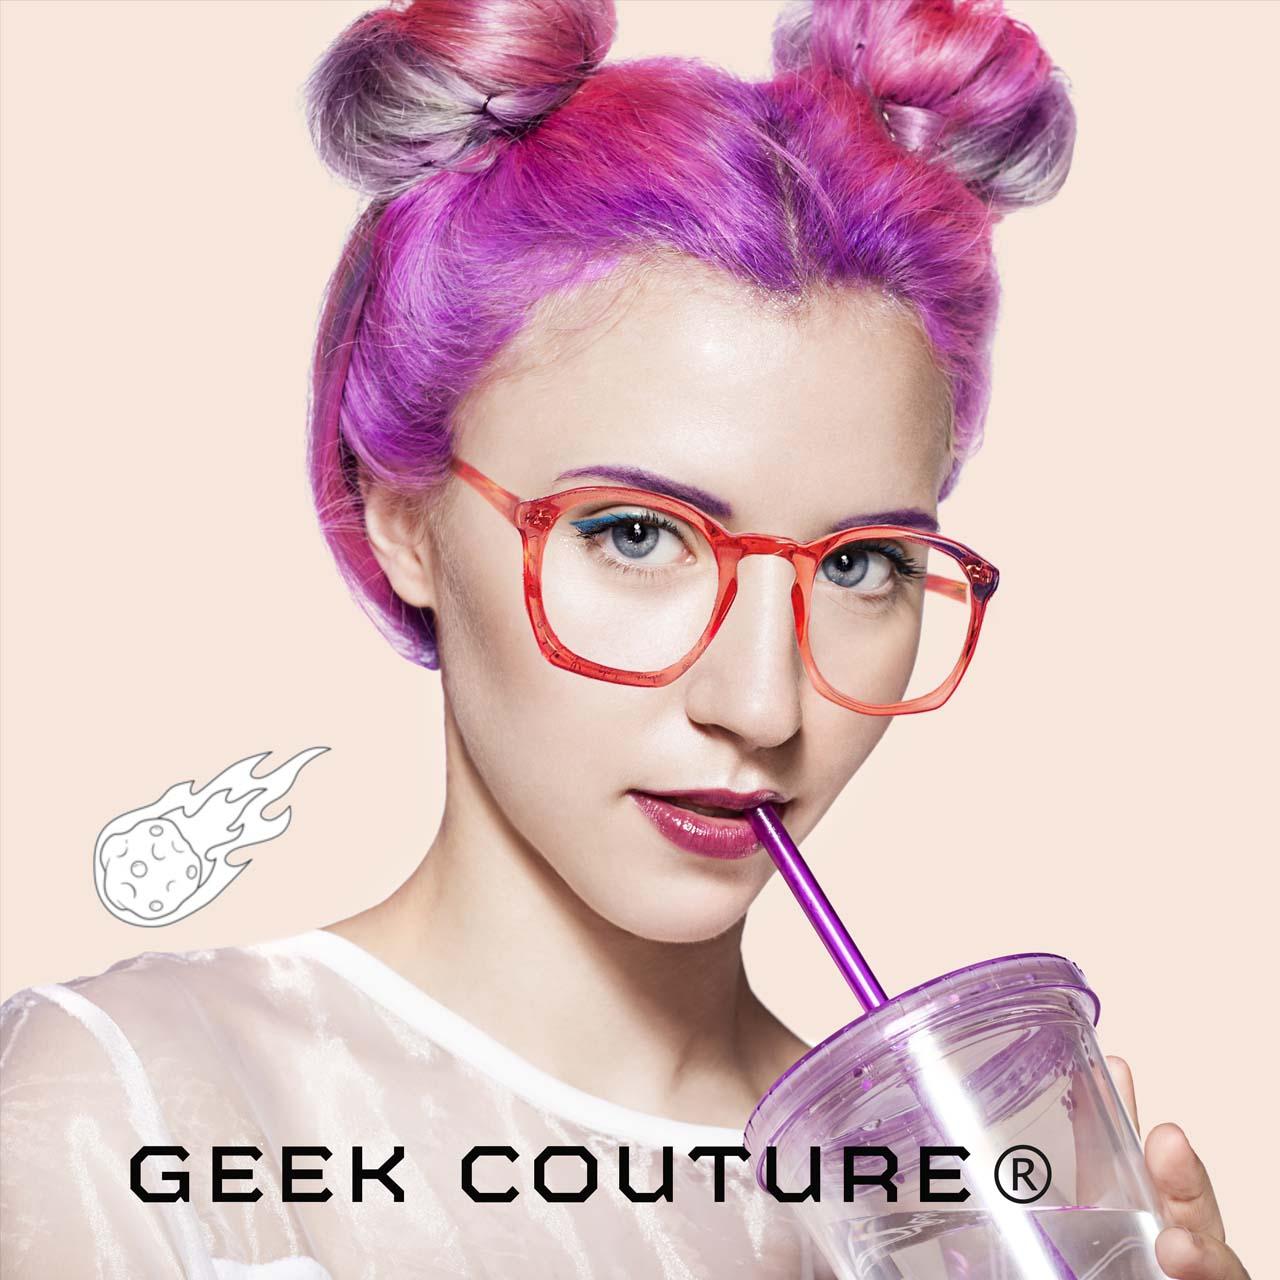 geek-couture-brand-2019.jpg